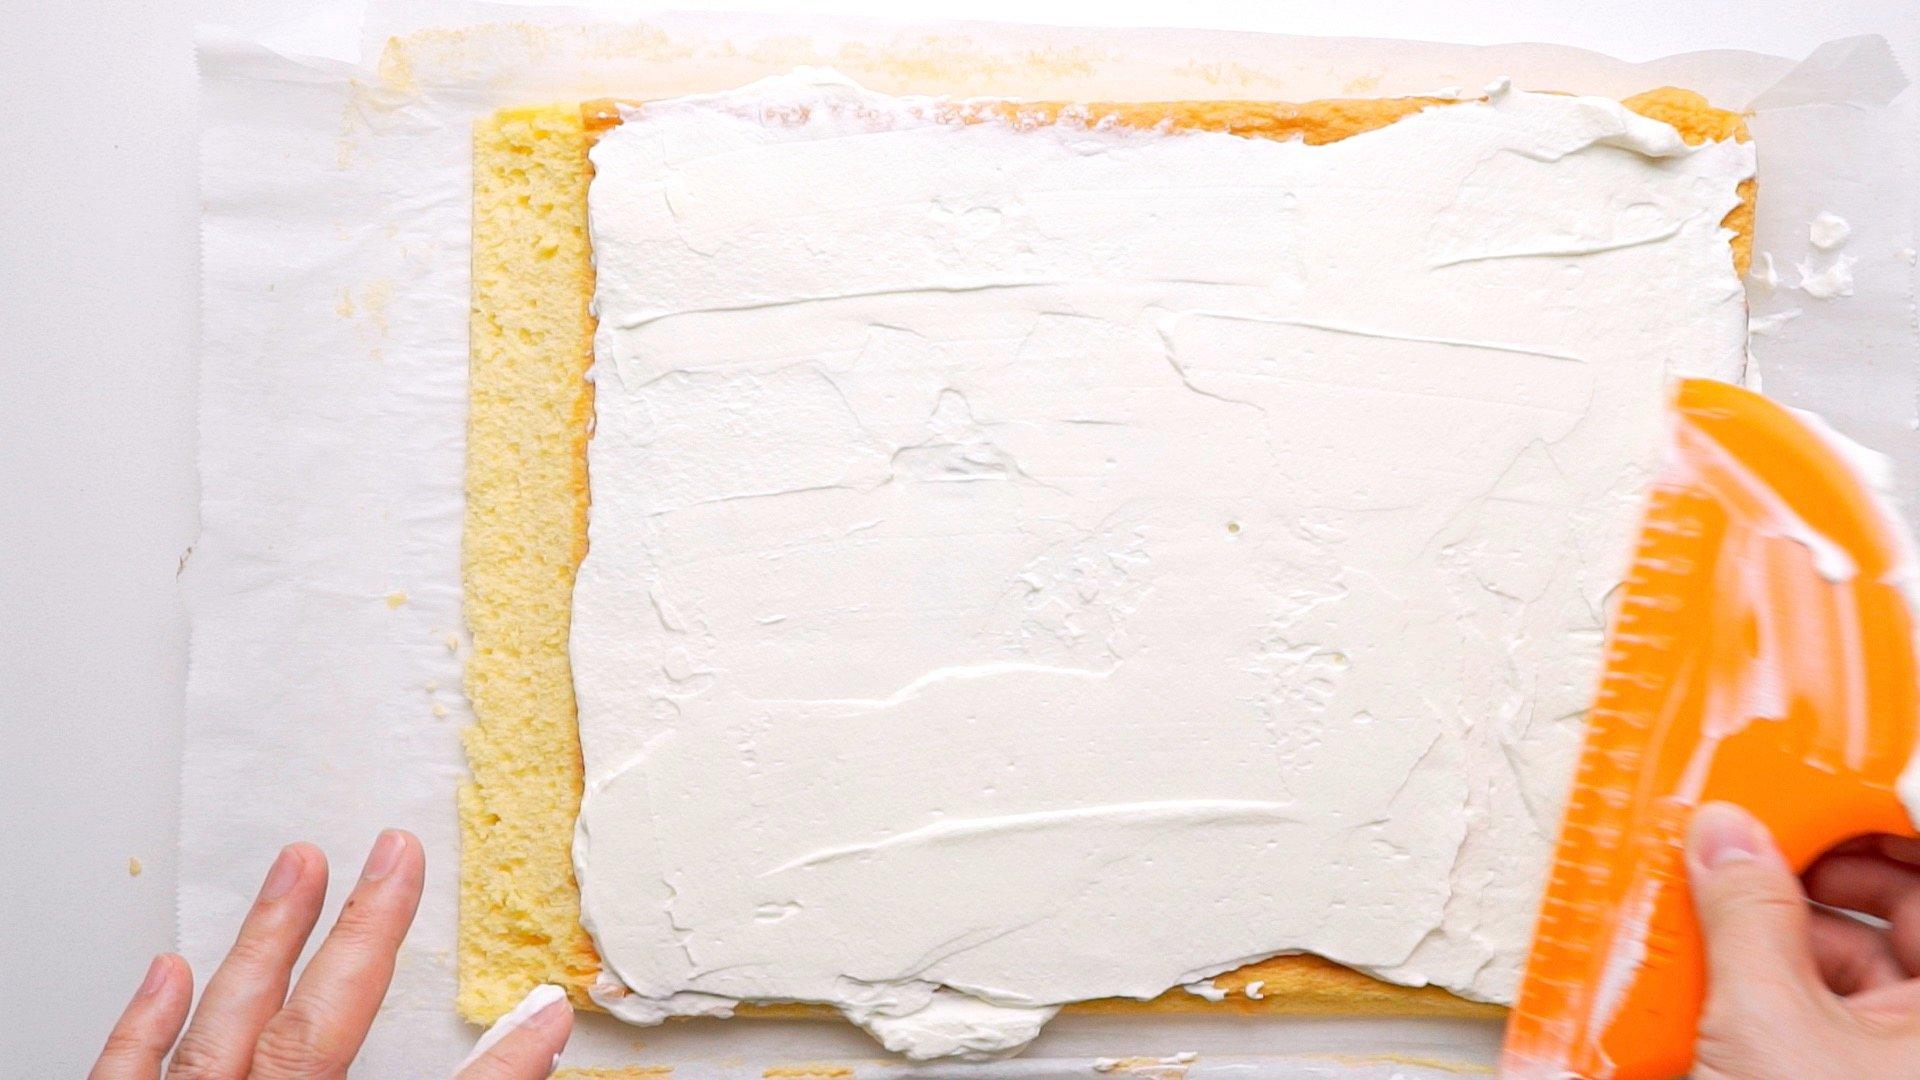 Spreading whipped cream onto sponge cake.